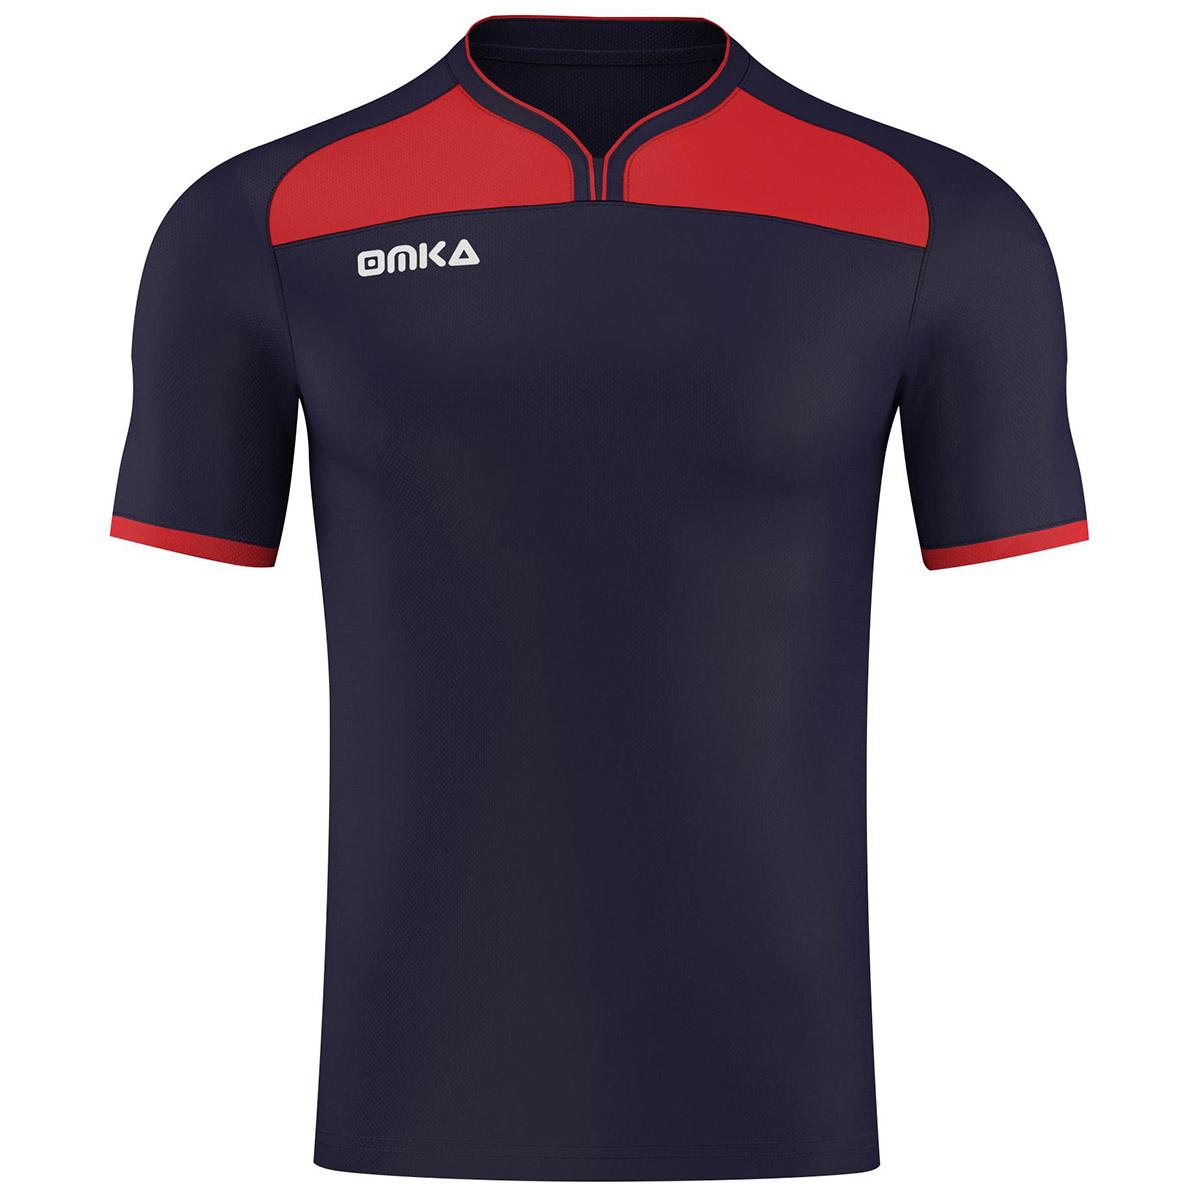 purchase cheap 01b2a 62217 OMKA Soccer Uniforms shirt Team shirt Fan shirt | German Wear Bavarian  Motorrad Sport Dresses & Shoes